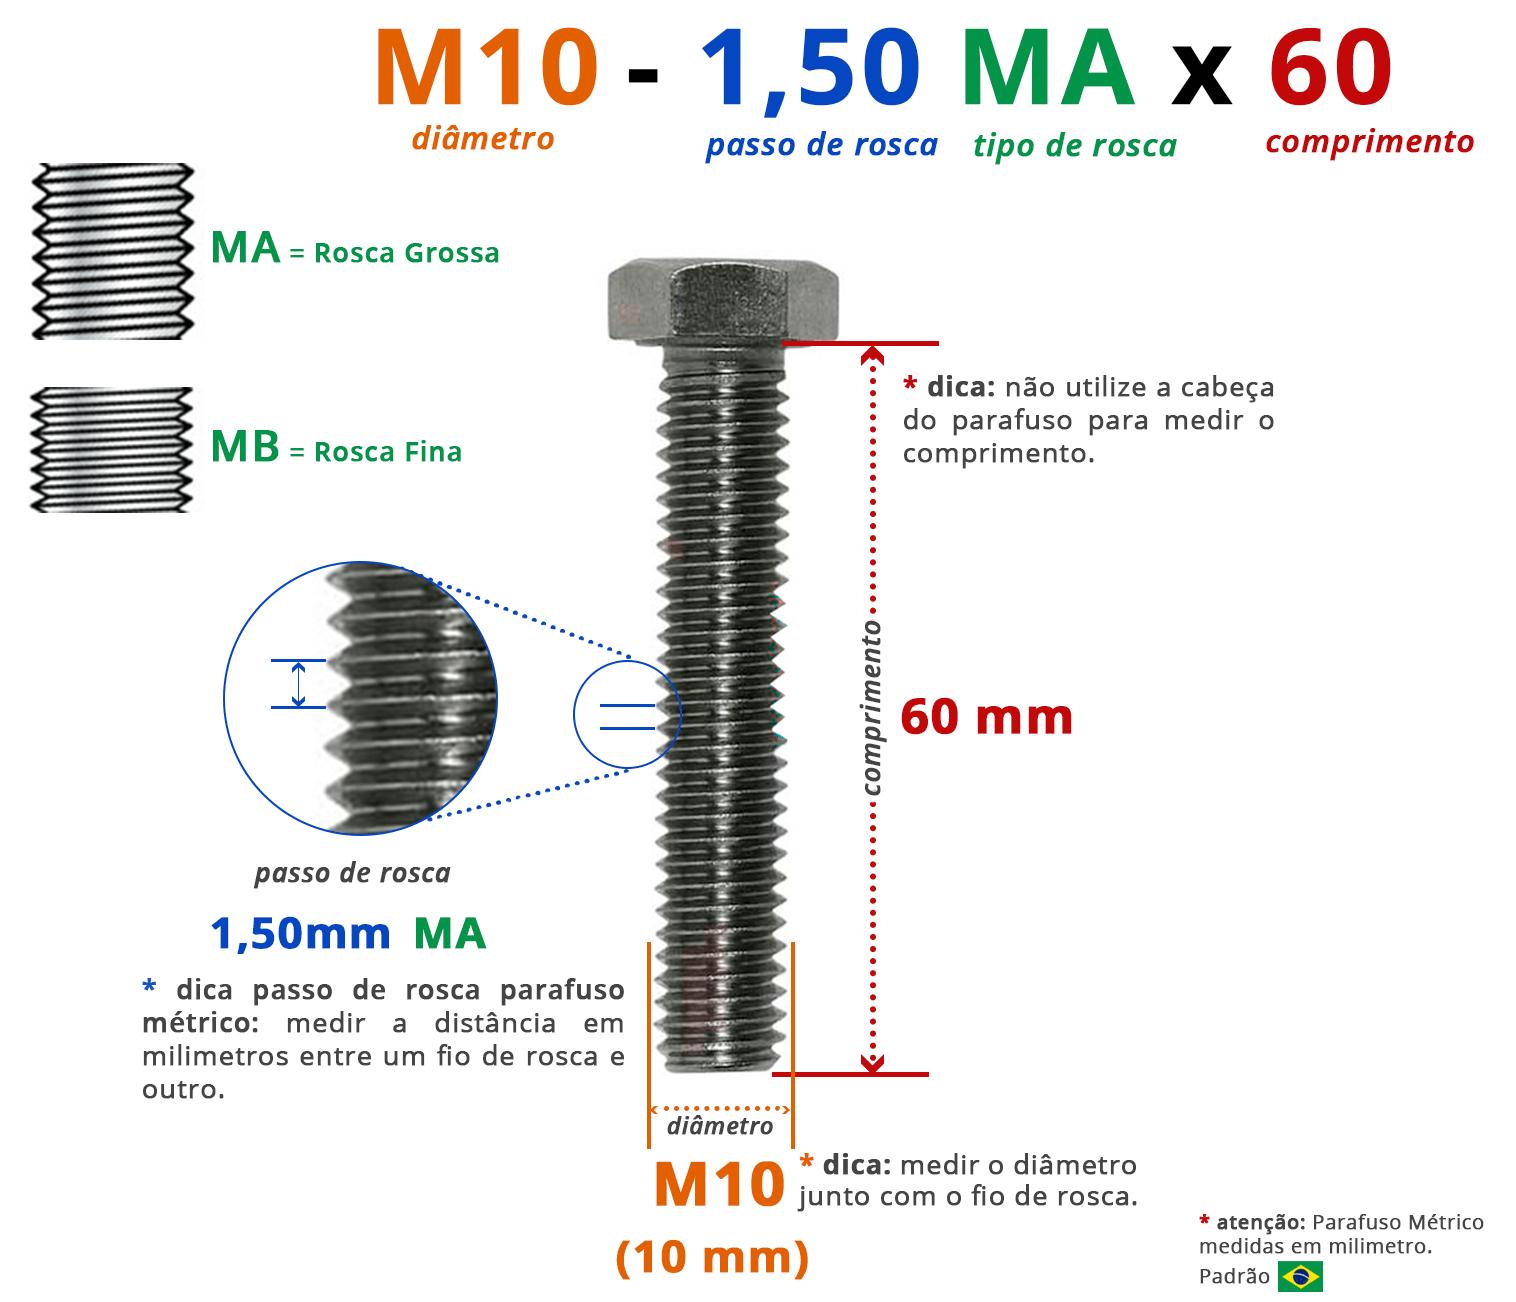 PARAFUSO SEXTAVADO ROSCA INTEIRA M10 1,50 MA X 60 DIN 933 INOX A4